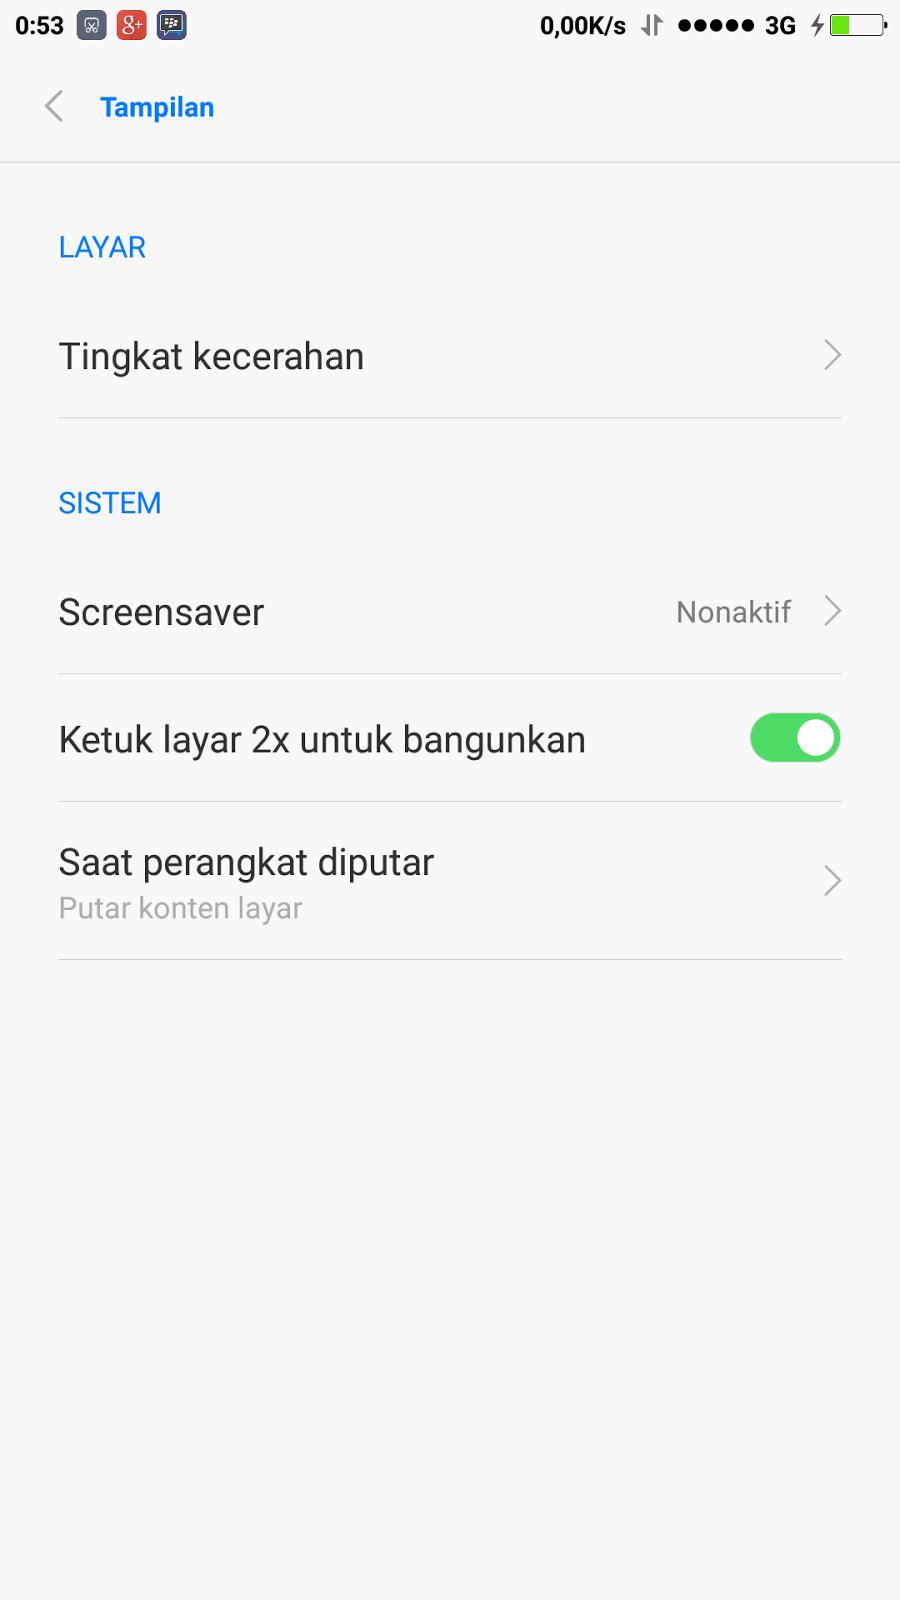 Cara Buka Dan Kunci Layar Xiaomi Mi 4i Tanpa Tombol Daya